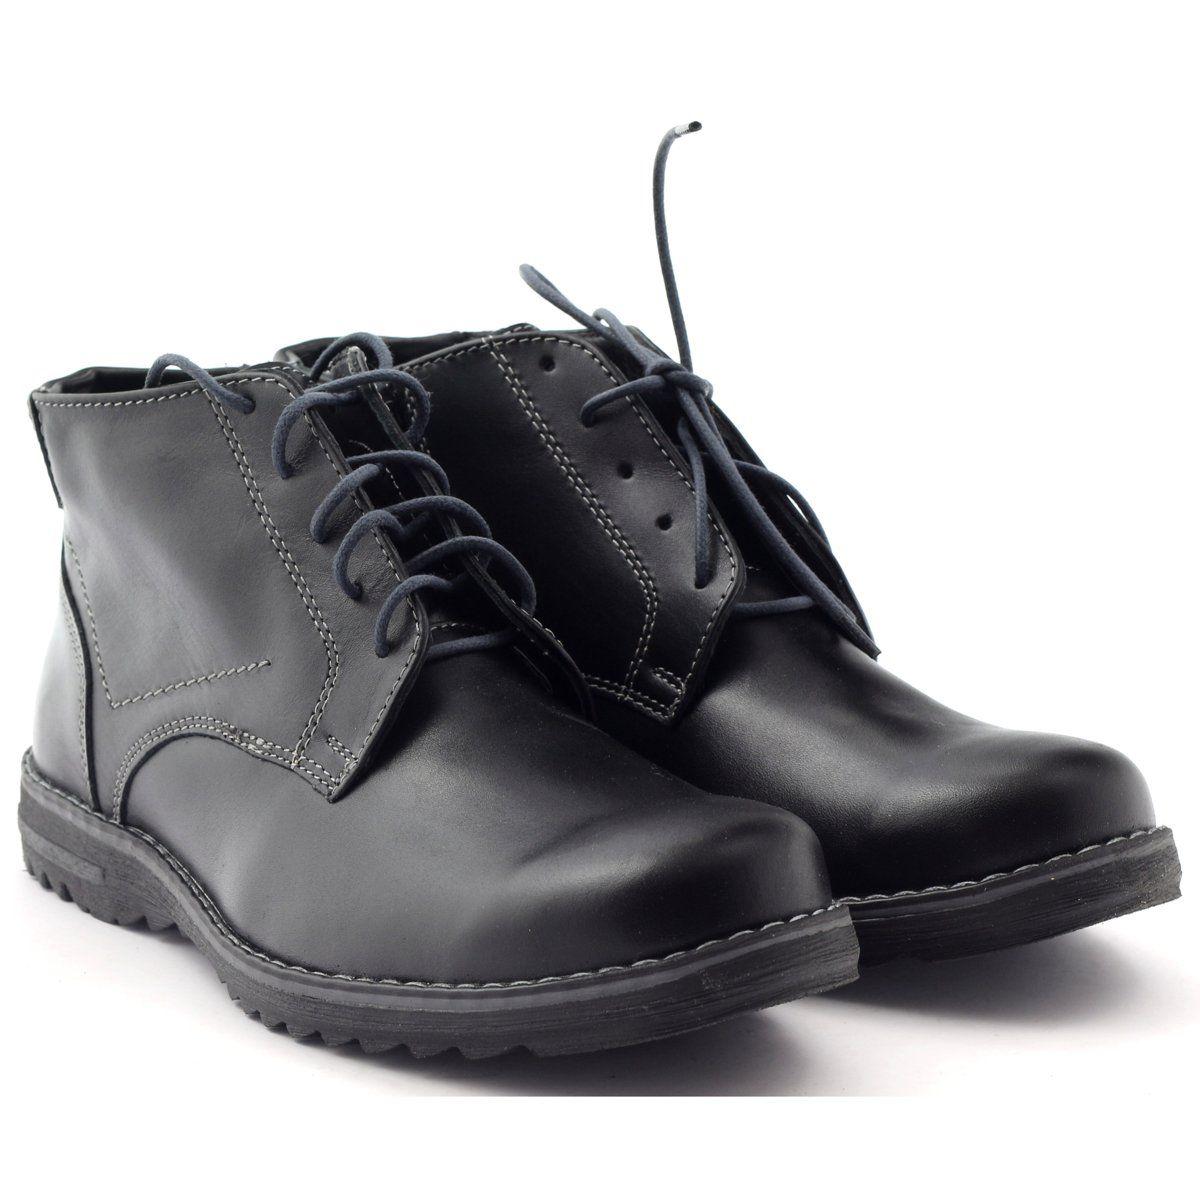 Trzewiki Meskie Skorzane Czarne Naszbut 954 Boots Combat Boots Shoes